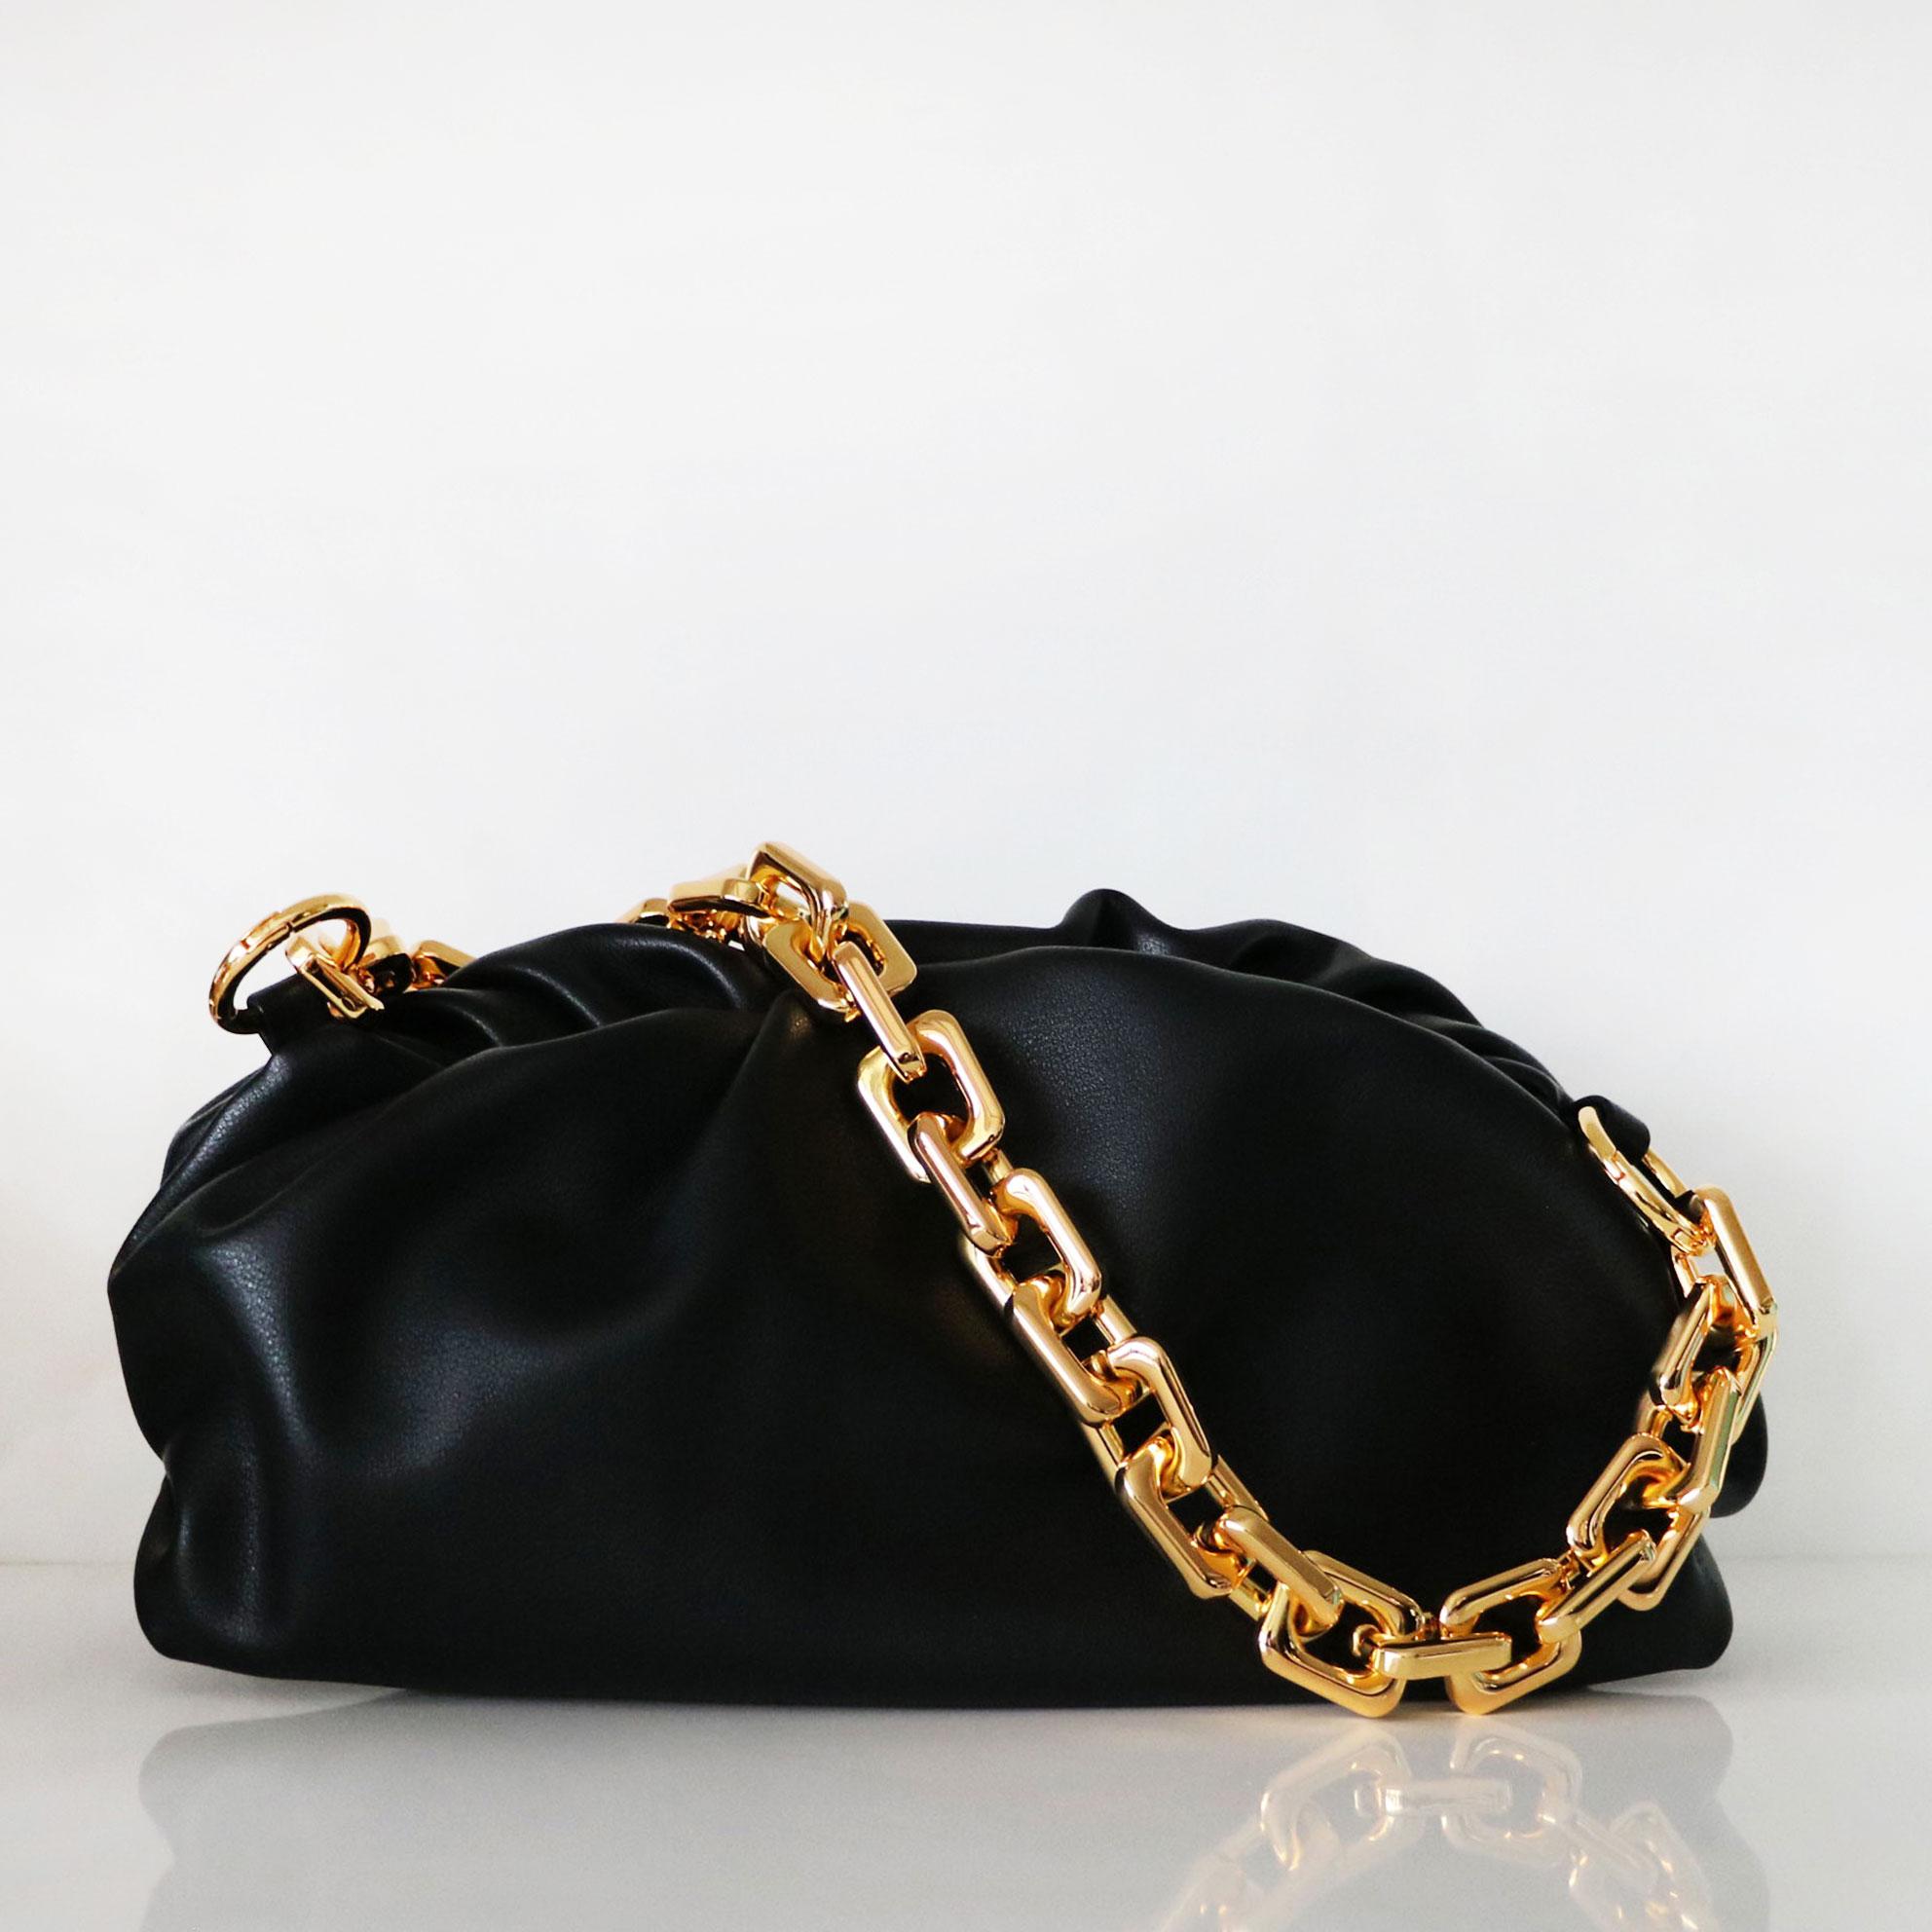 New Lady's bag Genuine Leather Women's Handbags Designer Women Bag On The Shoulder Fashion Thick Chain Crossbody Cloud Bag